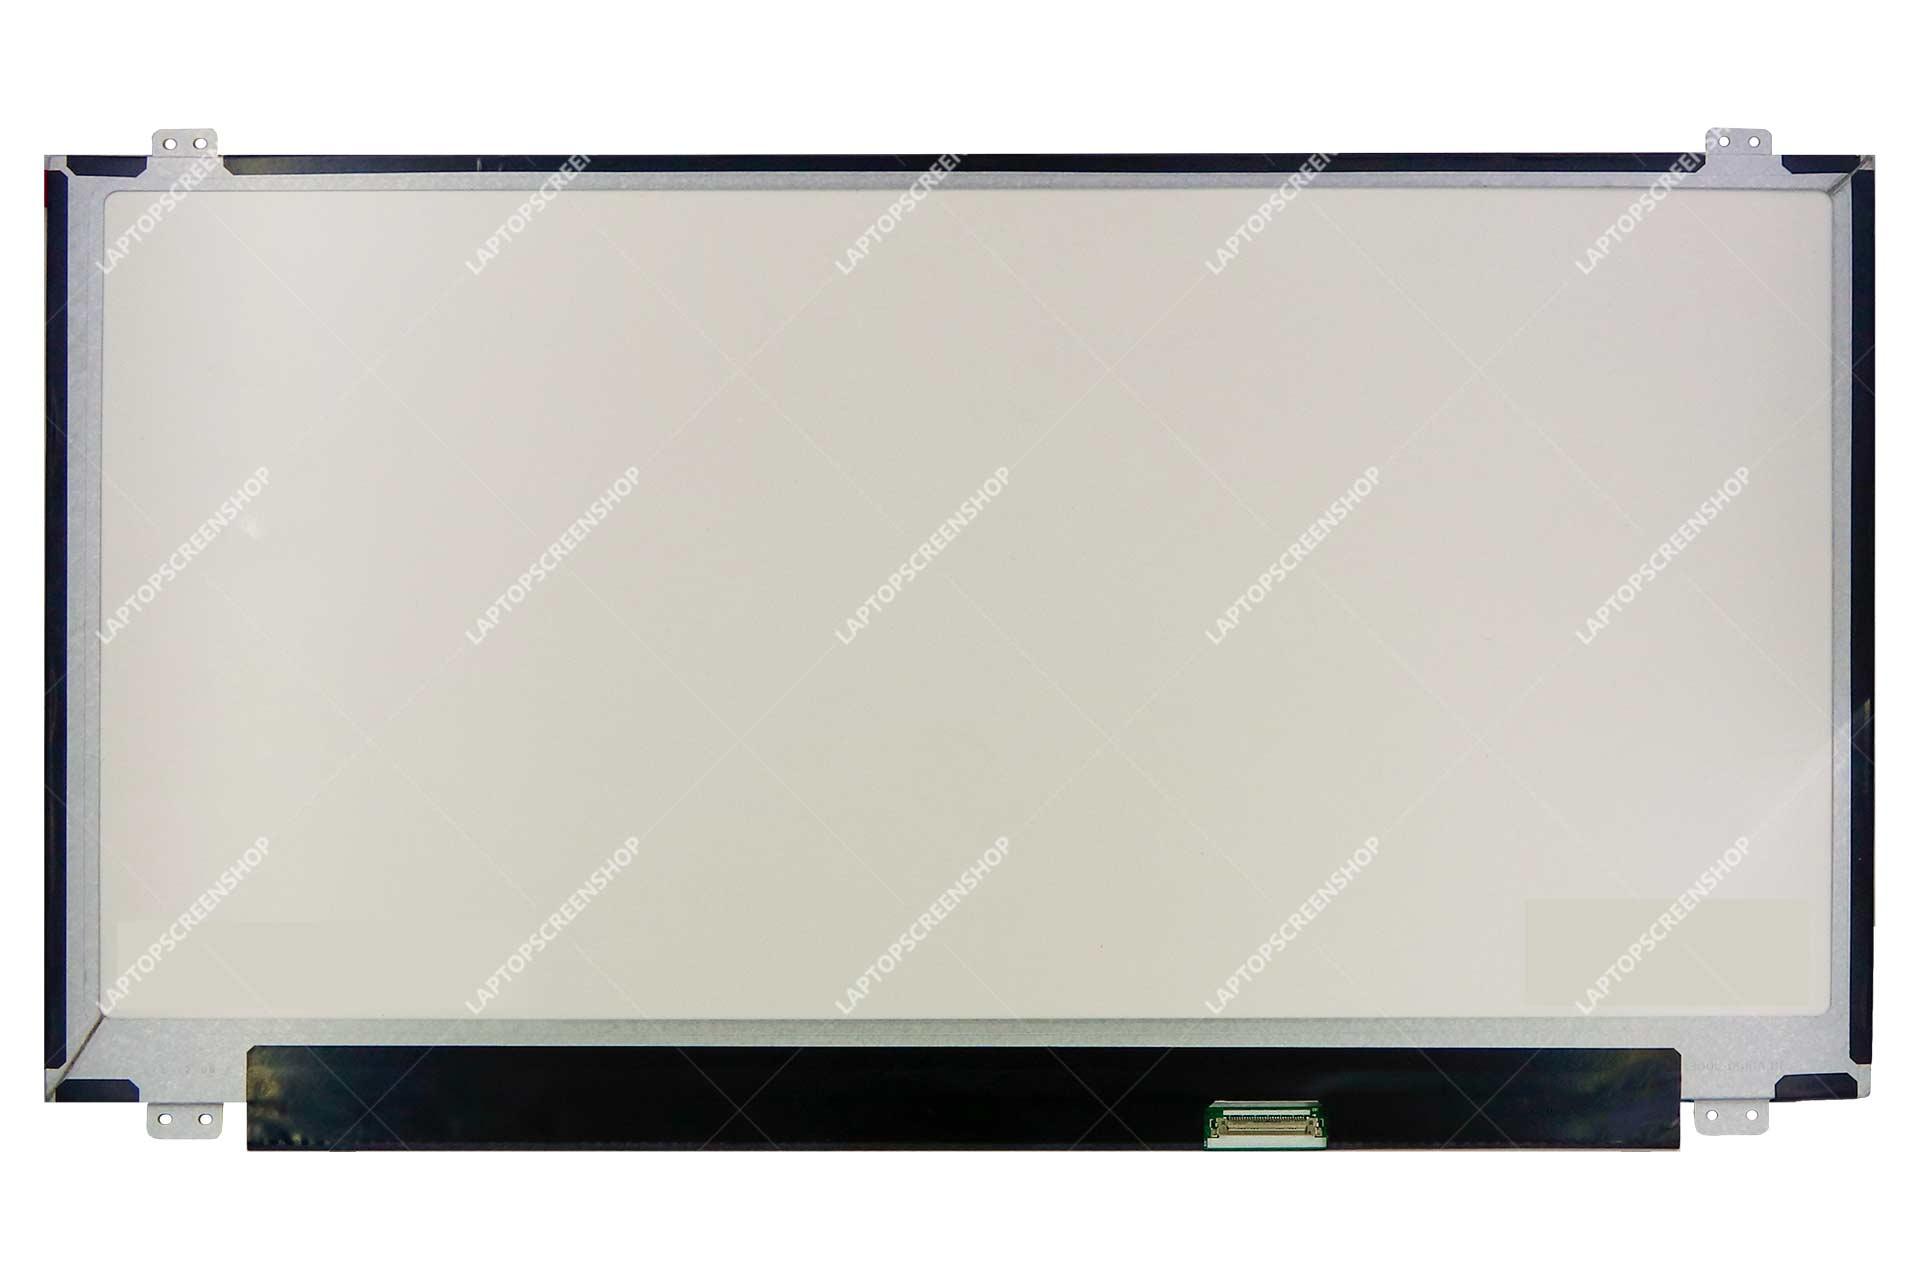 ACER-ASPIRE-E1-530-4618-LCD |HD|فروشگاه لپ تاپ اسکرين | تعمير لپ تاپ